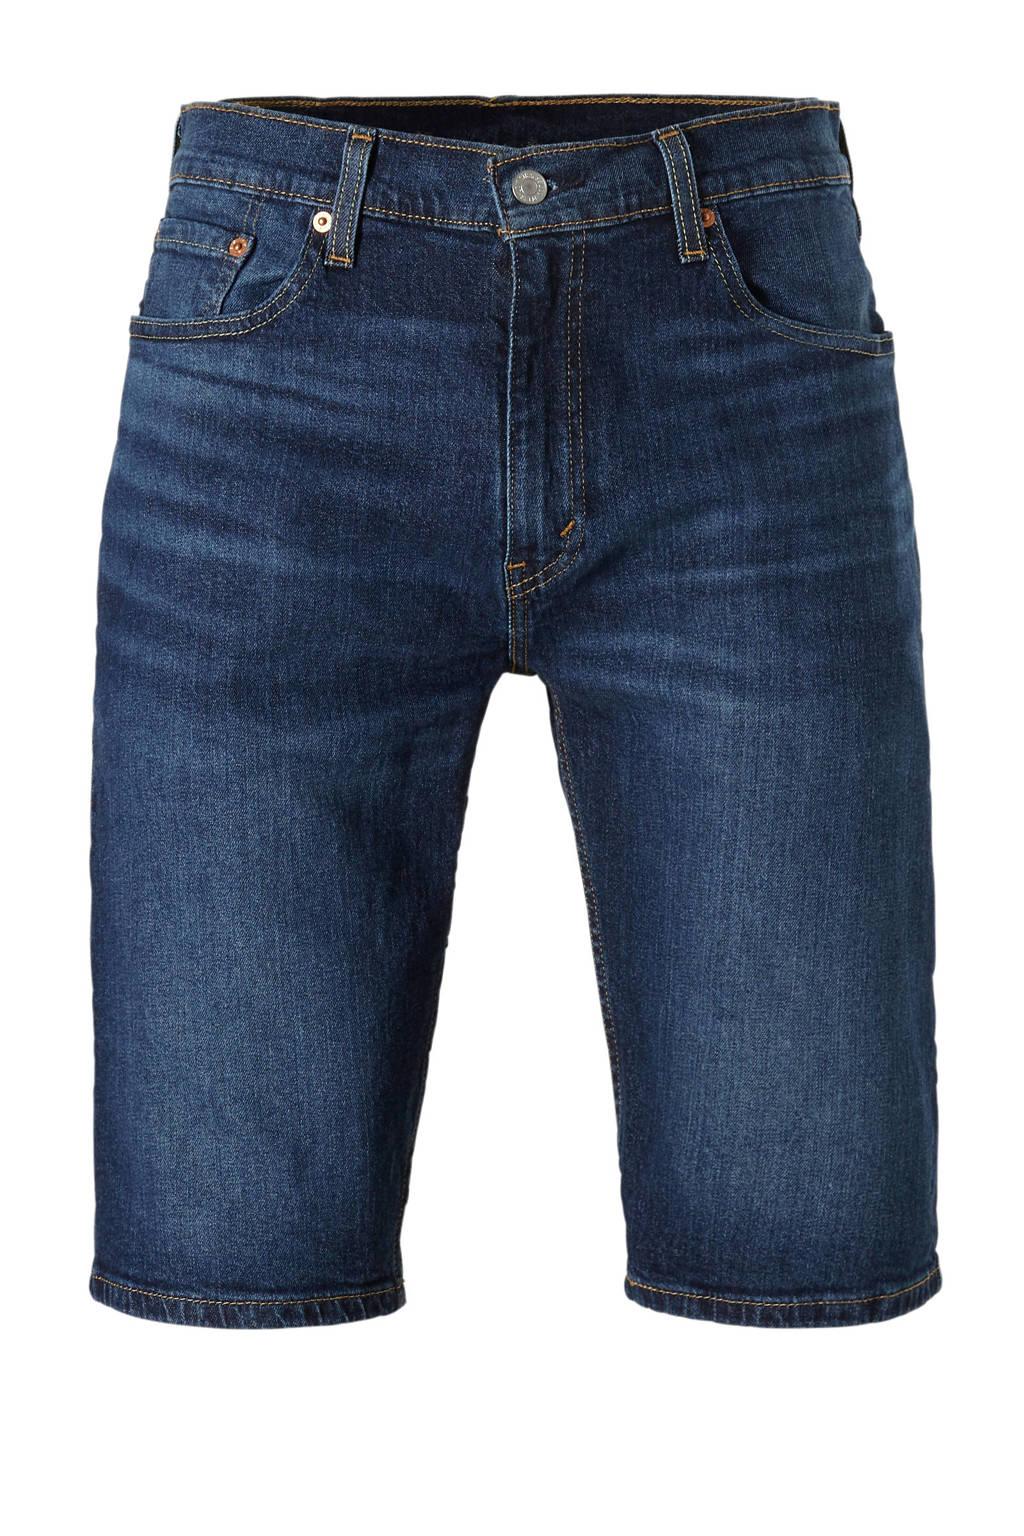 Levi's slim fit jeans short, Dark denim